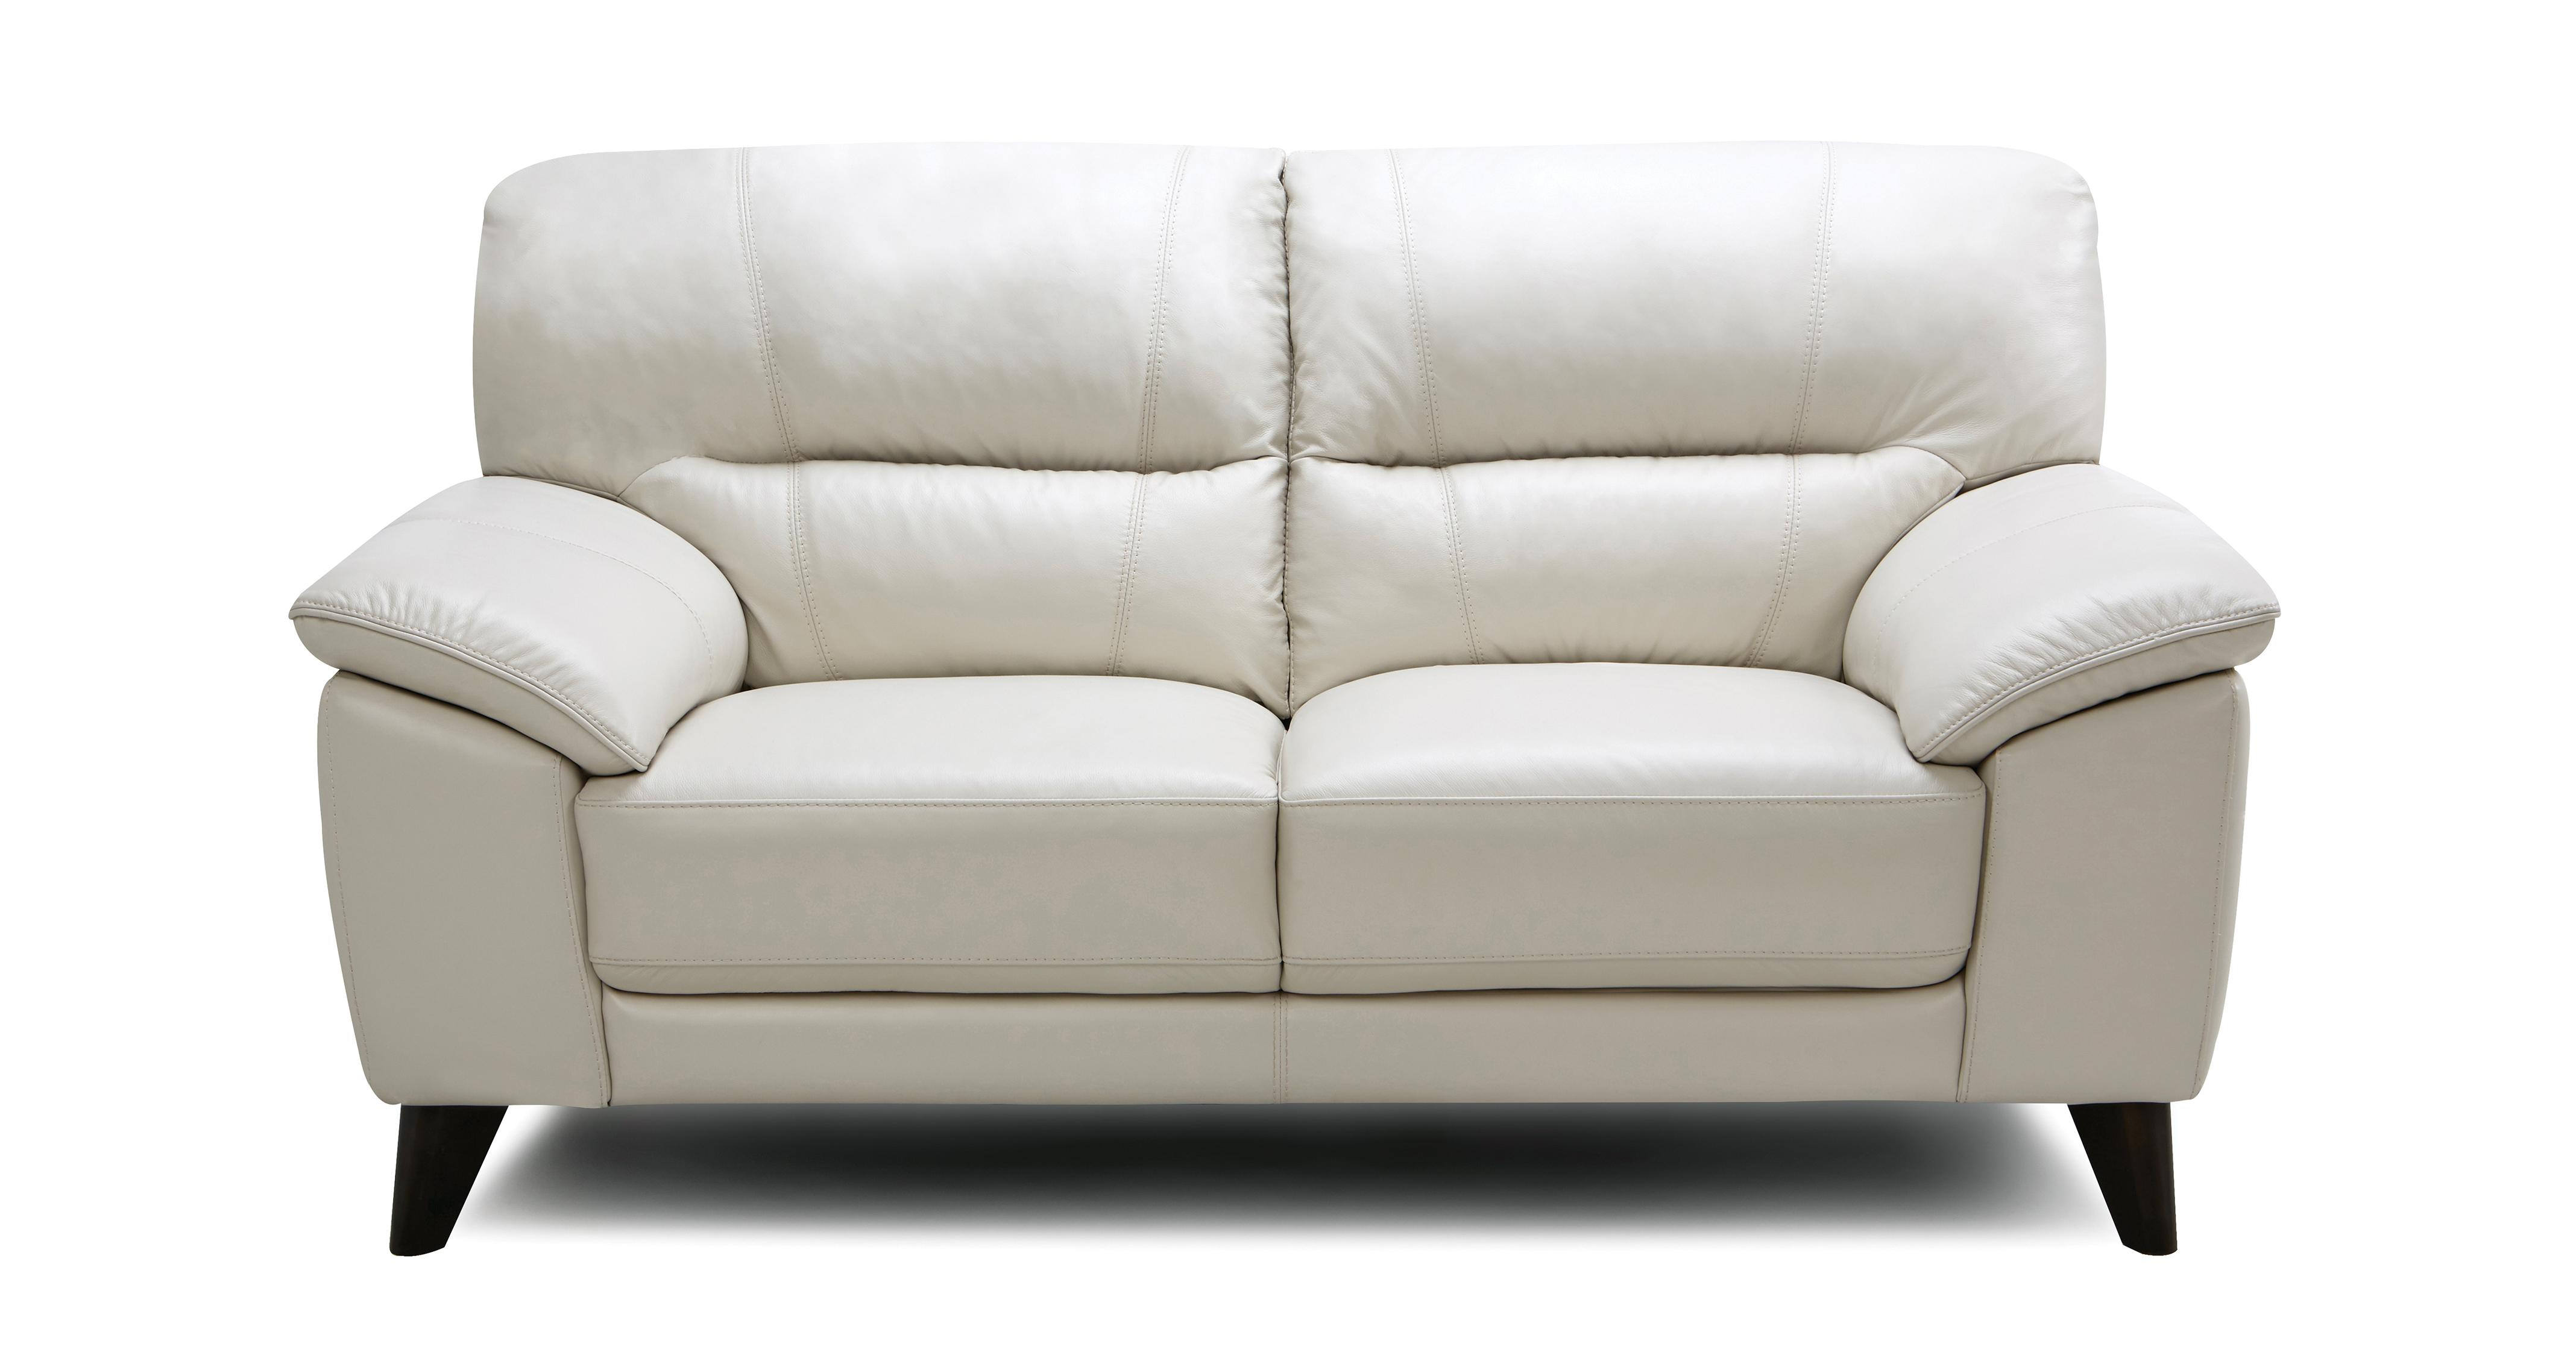 Exceptionnel Barletta 2 Seater Sofa Premium | DFS